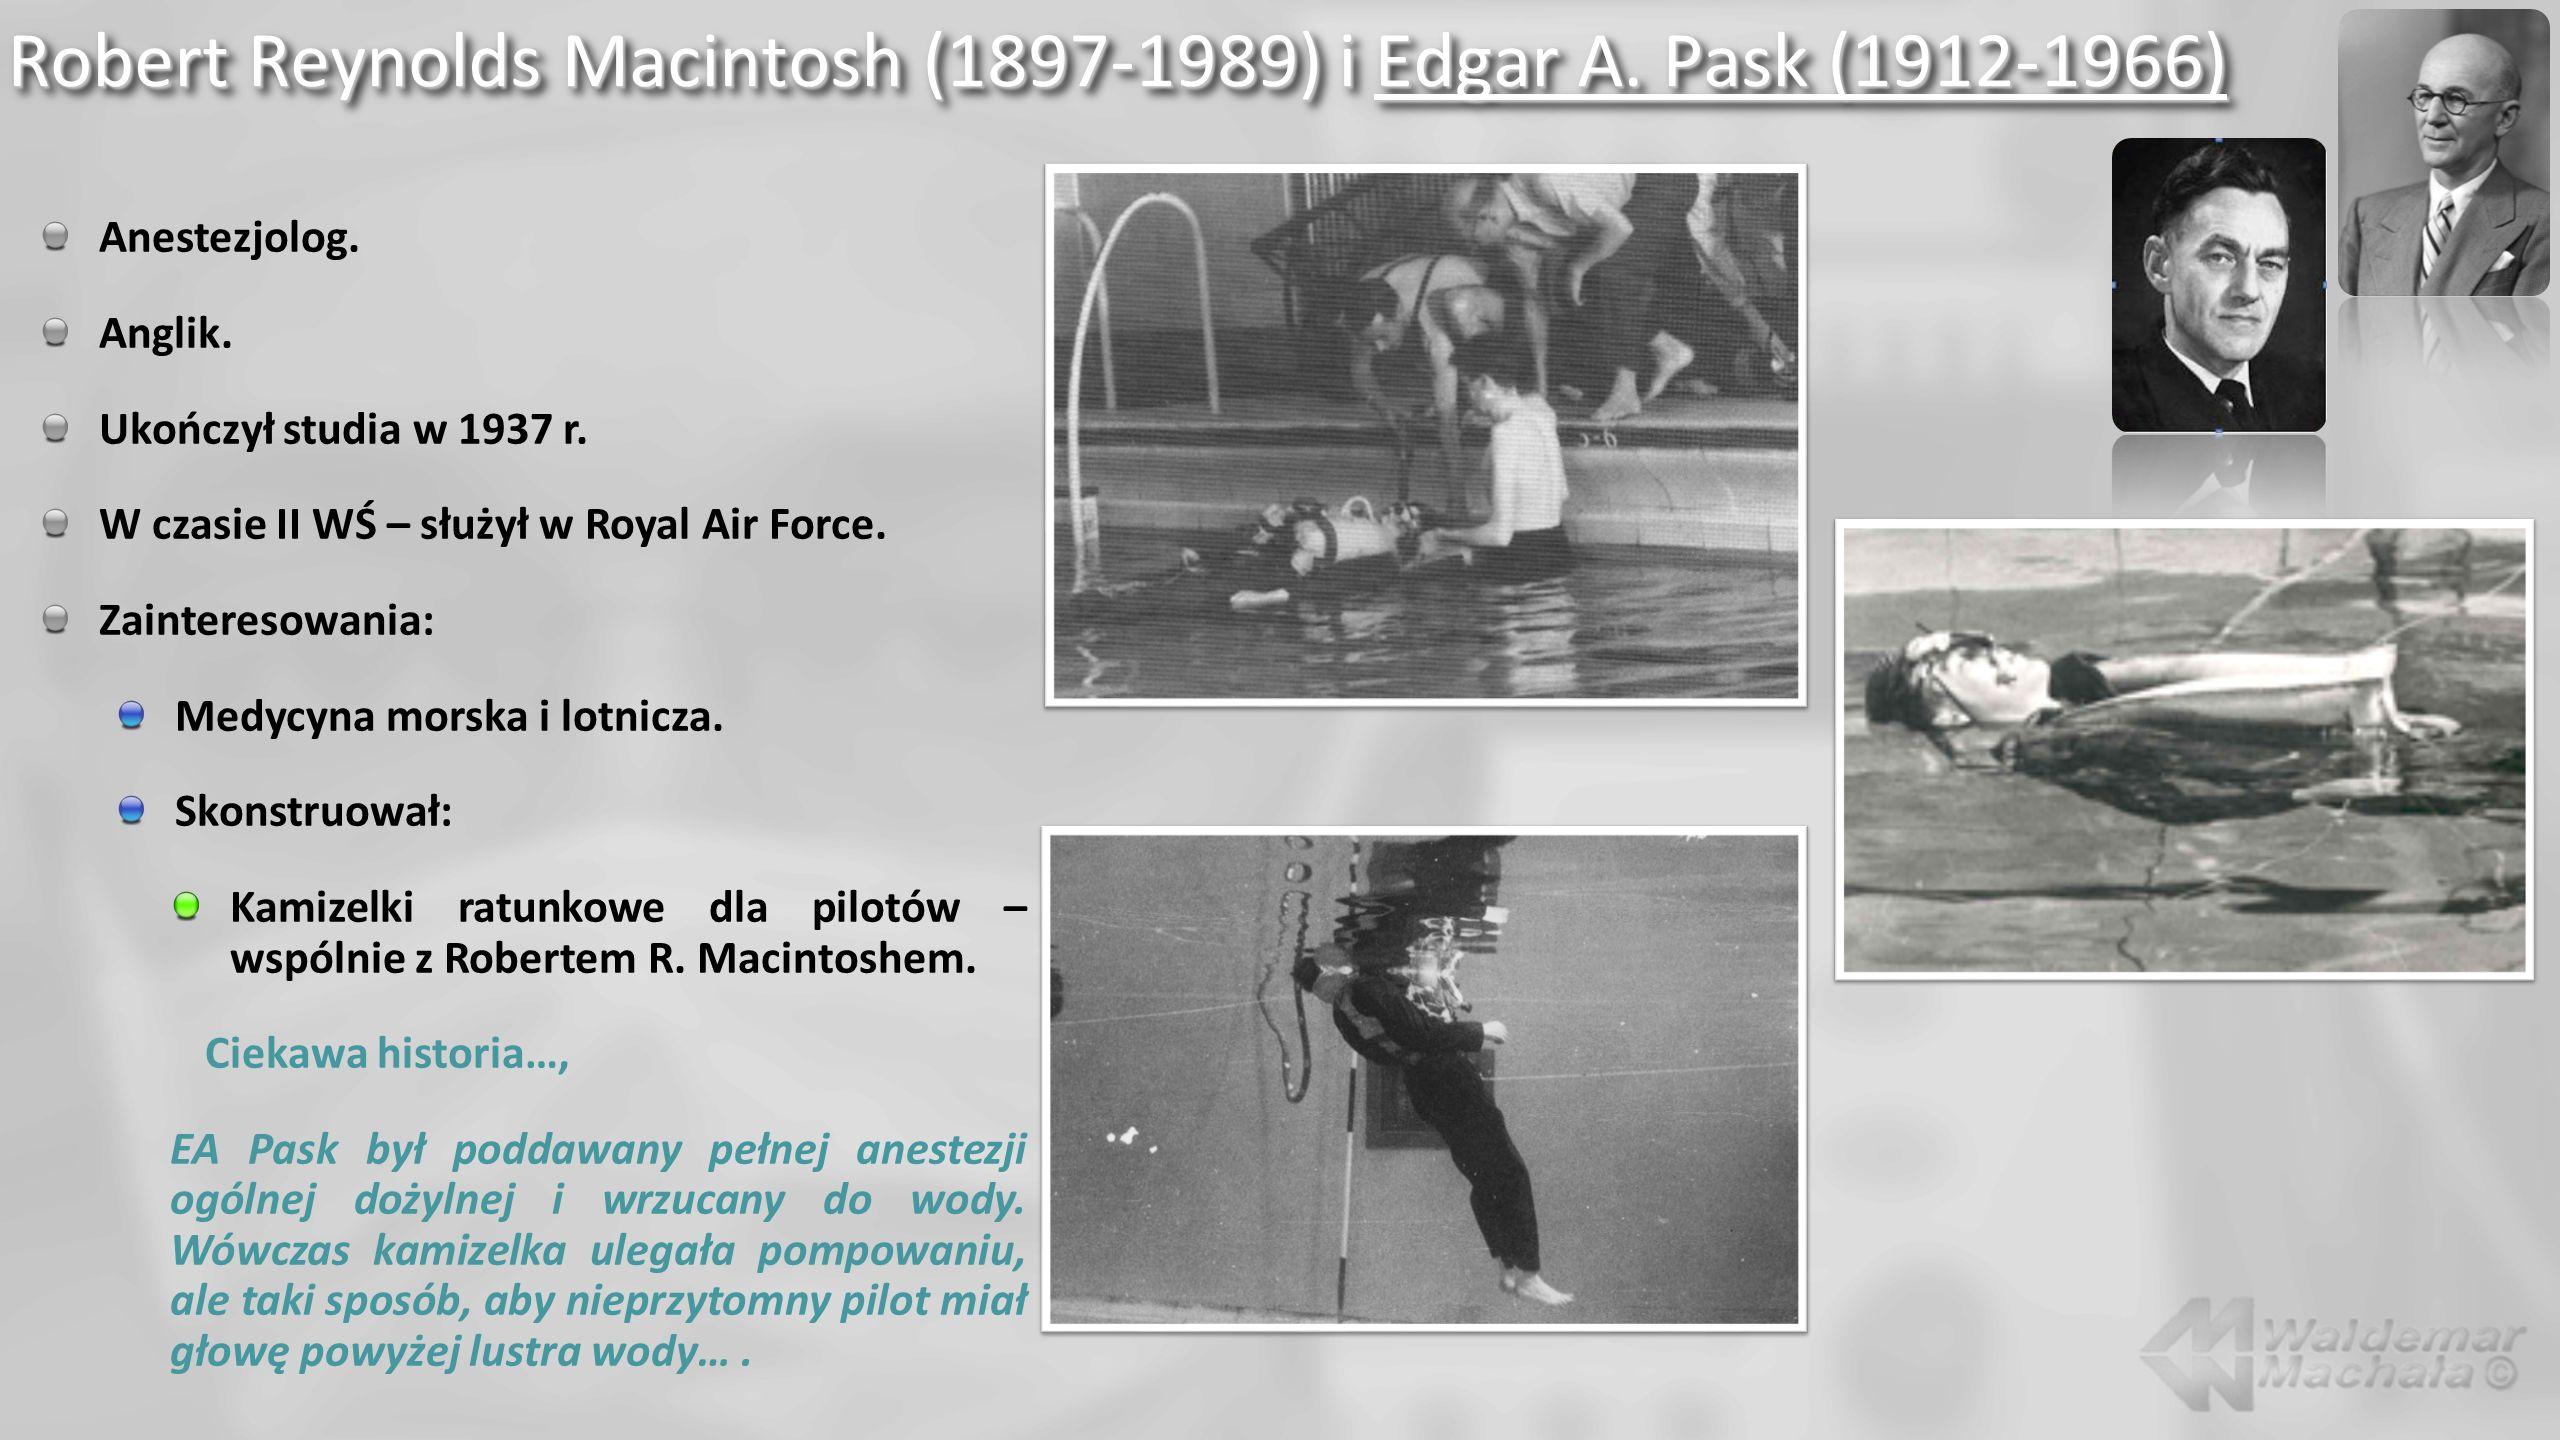 Robert Reynolds Macintosh (1897-1989) i Edgar A. Pask (1912-1966)